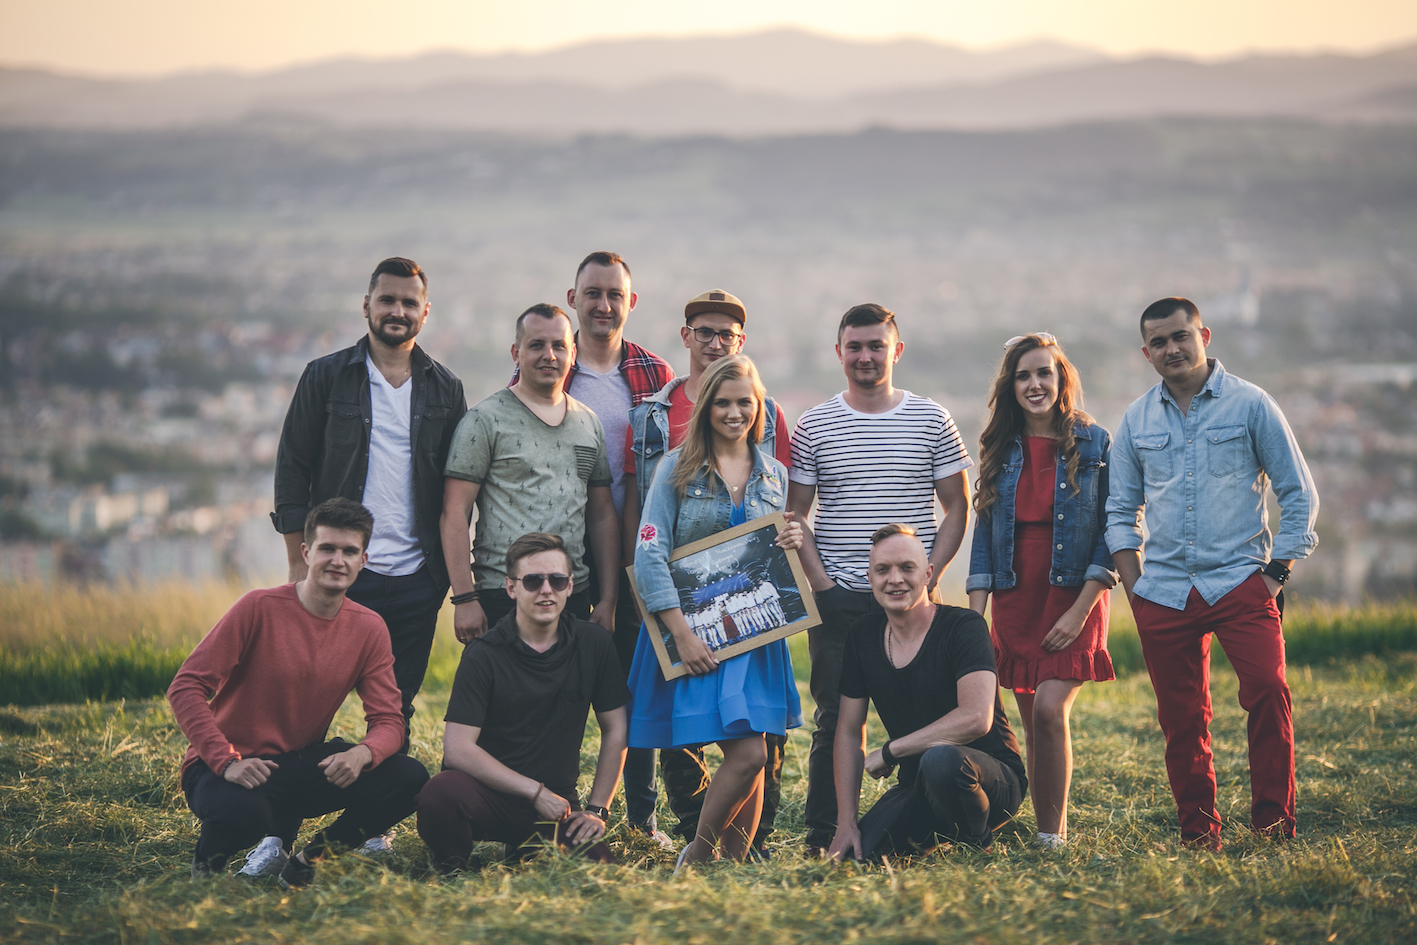 BlogStar: Ciupaga nagrywa z Kaczorowską - BlogStar.pl